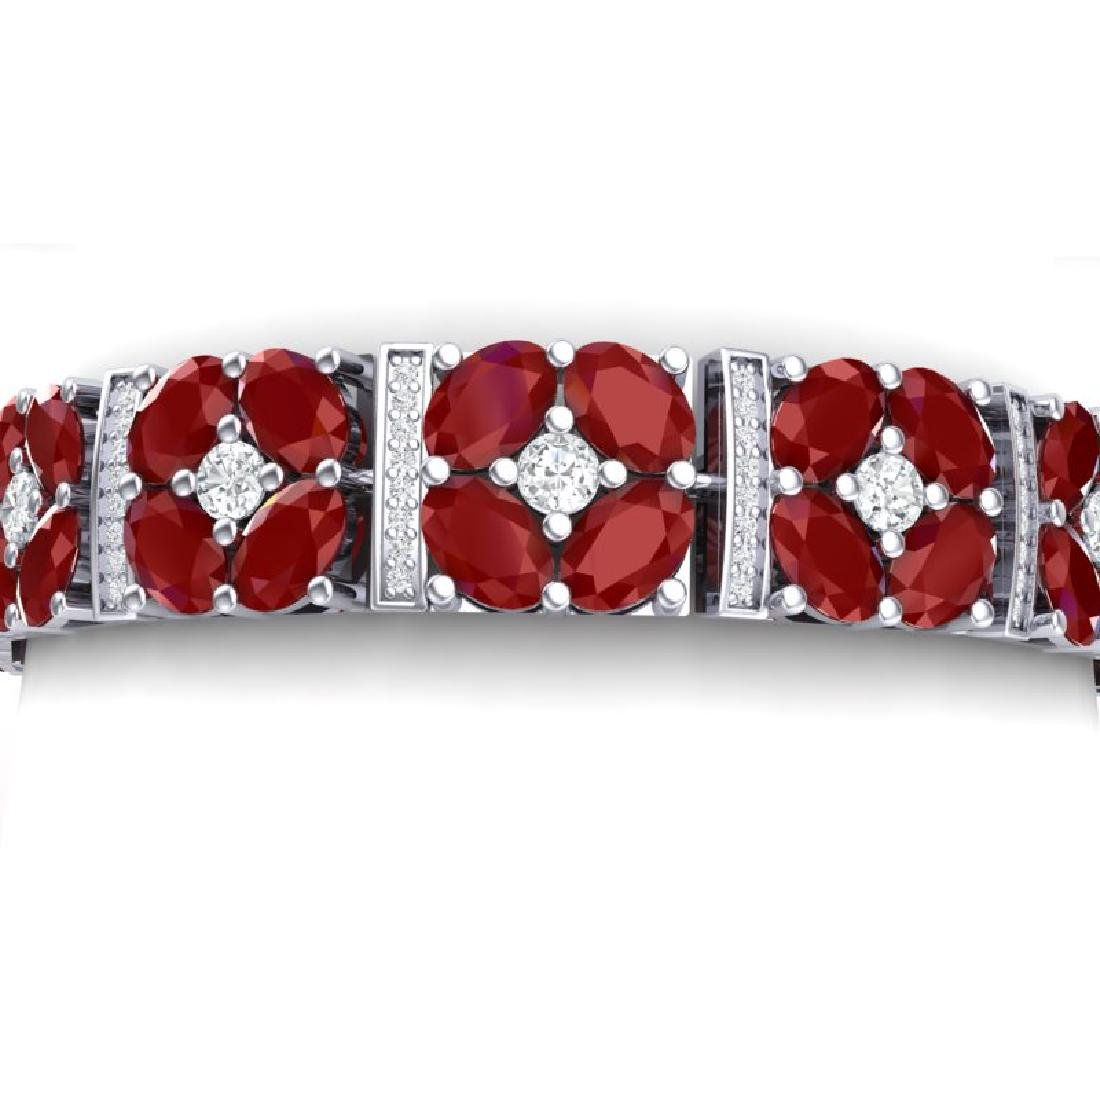 48.04 CTW Royalty Ruby & VS Diamond Bracelet 18K White